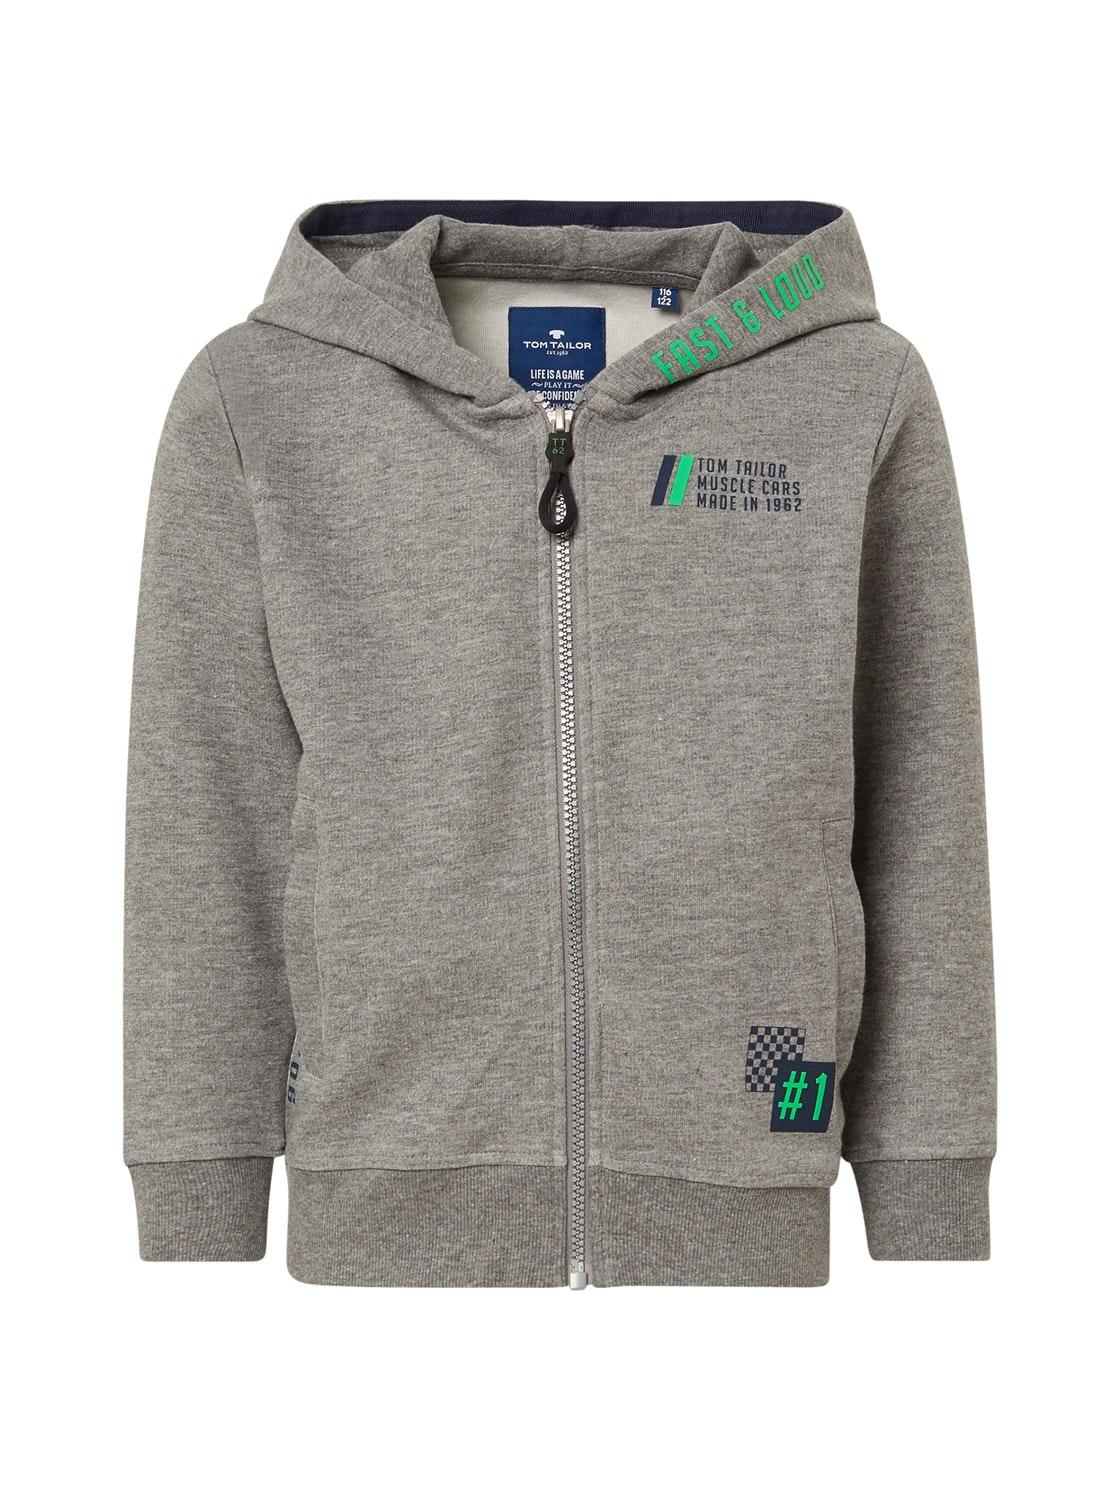 sweatjacket placed print, original-multicolored